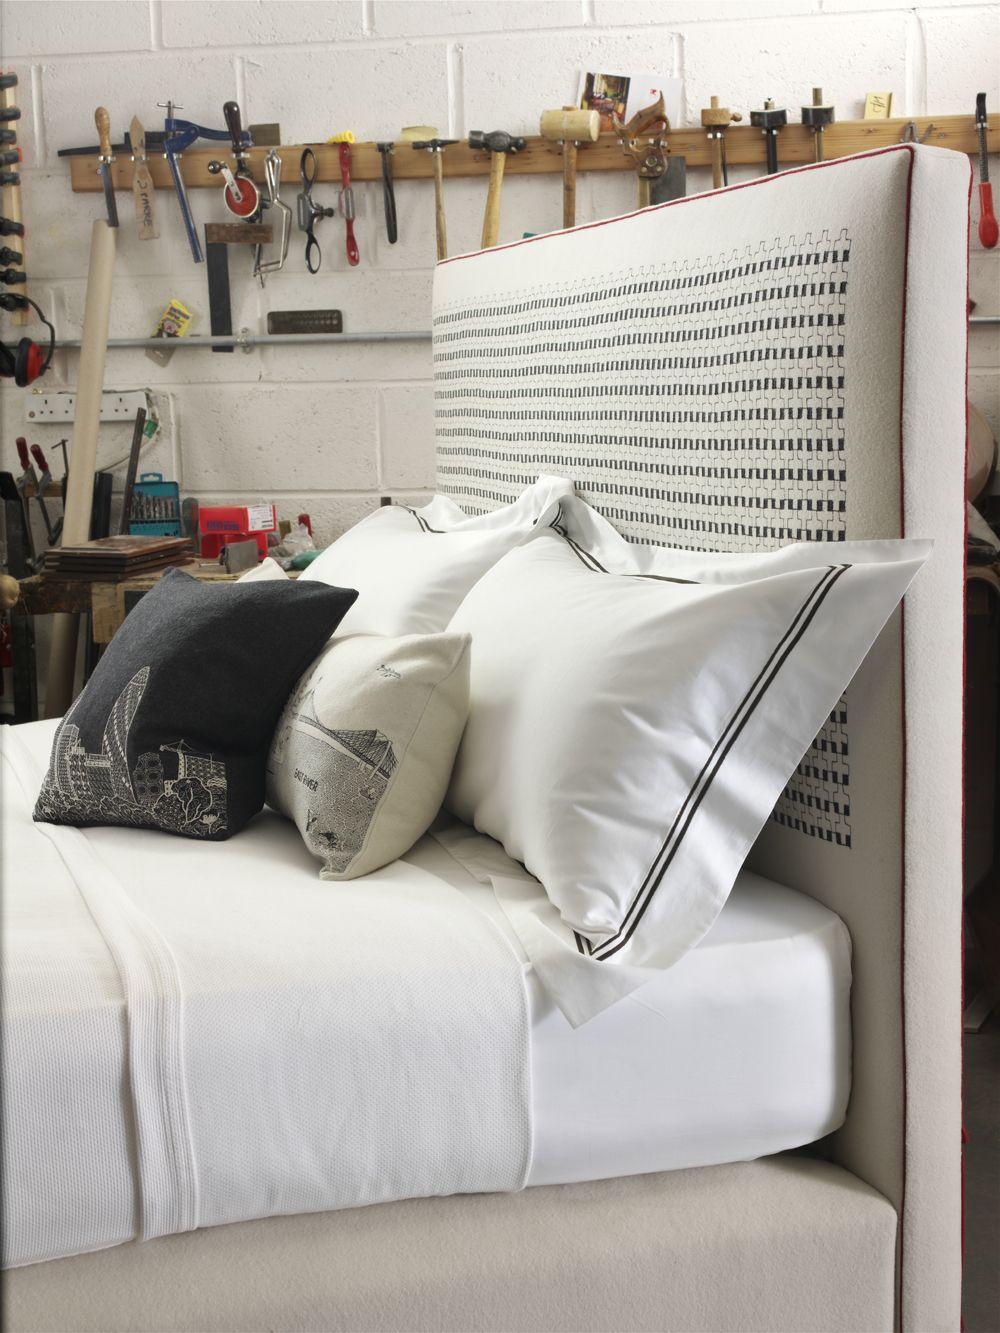 headboard detail savoir beds collaboration with designer charlene